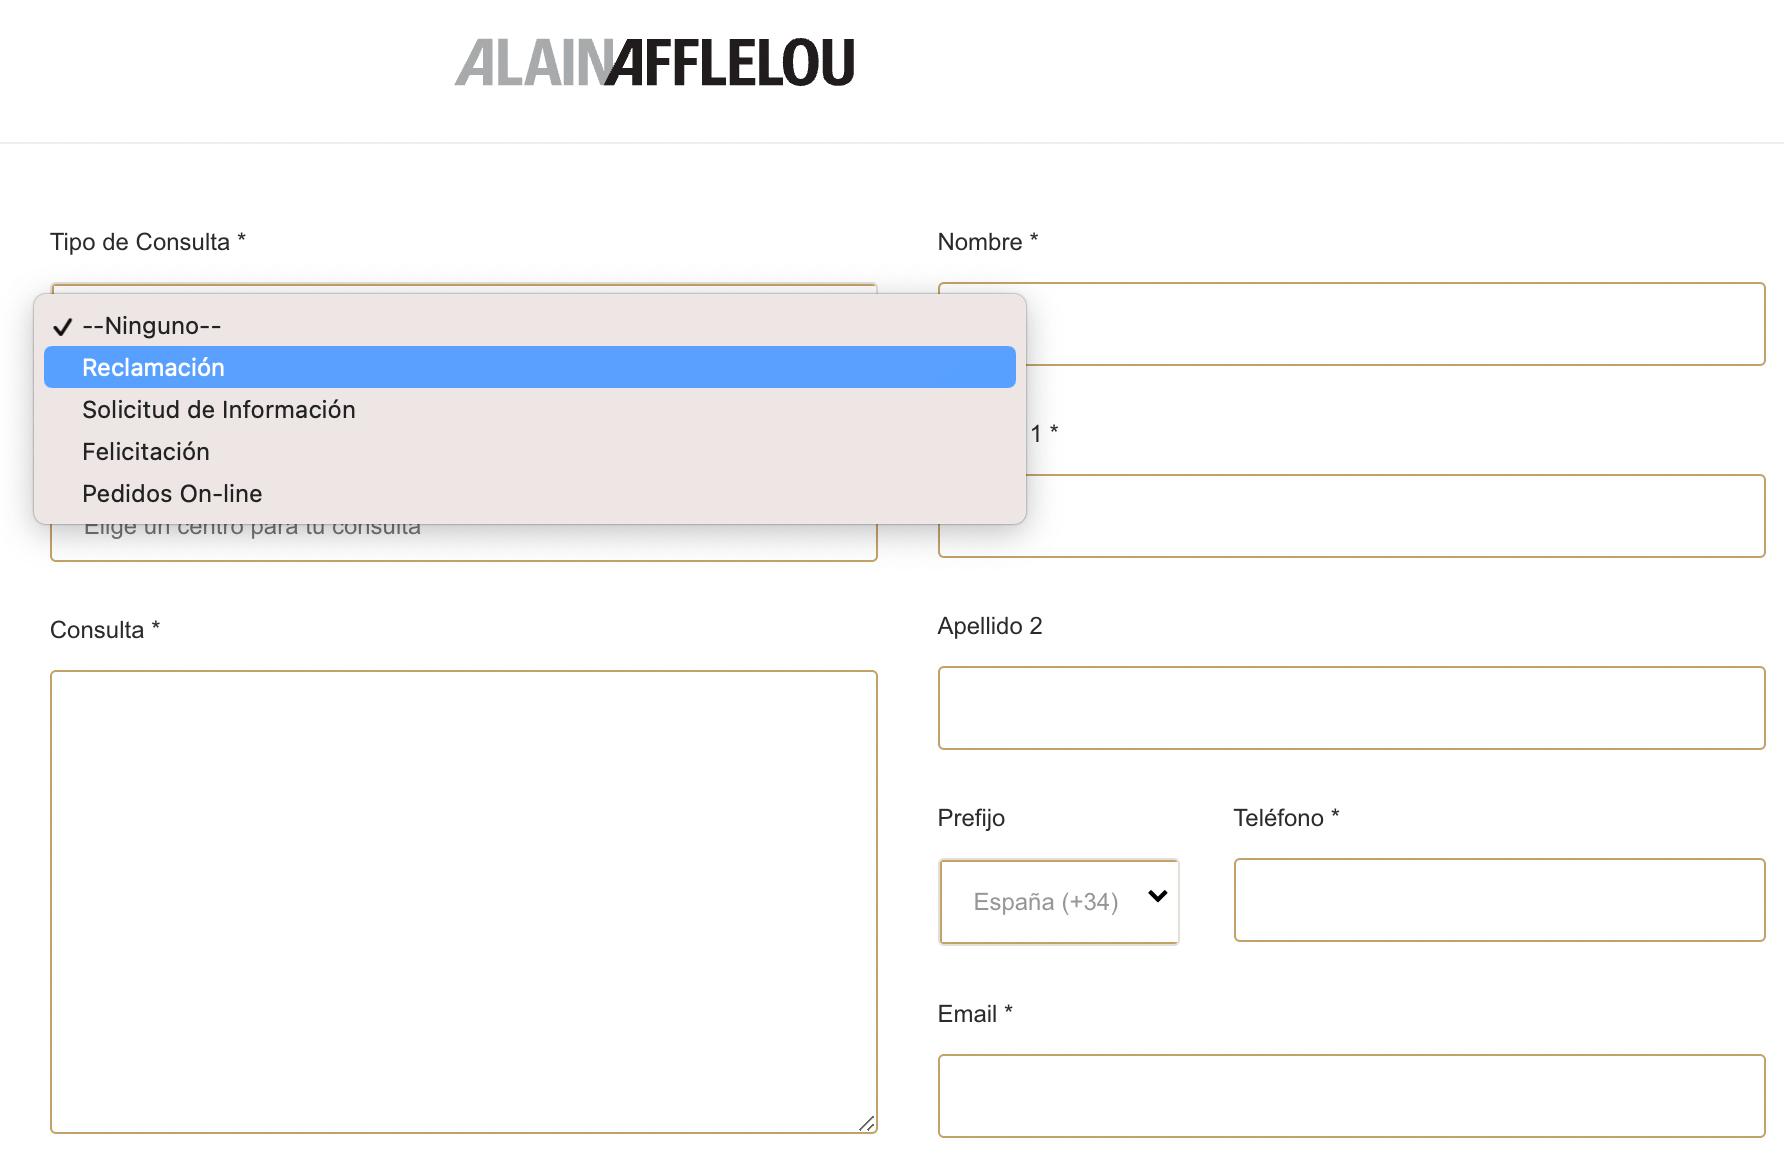 alain afflelou-return_policy-how-to